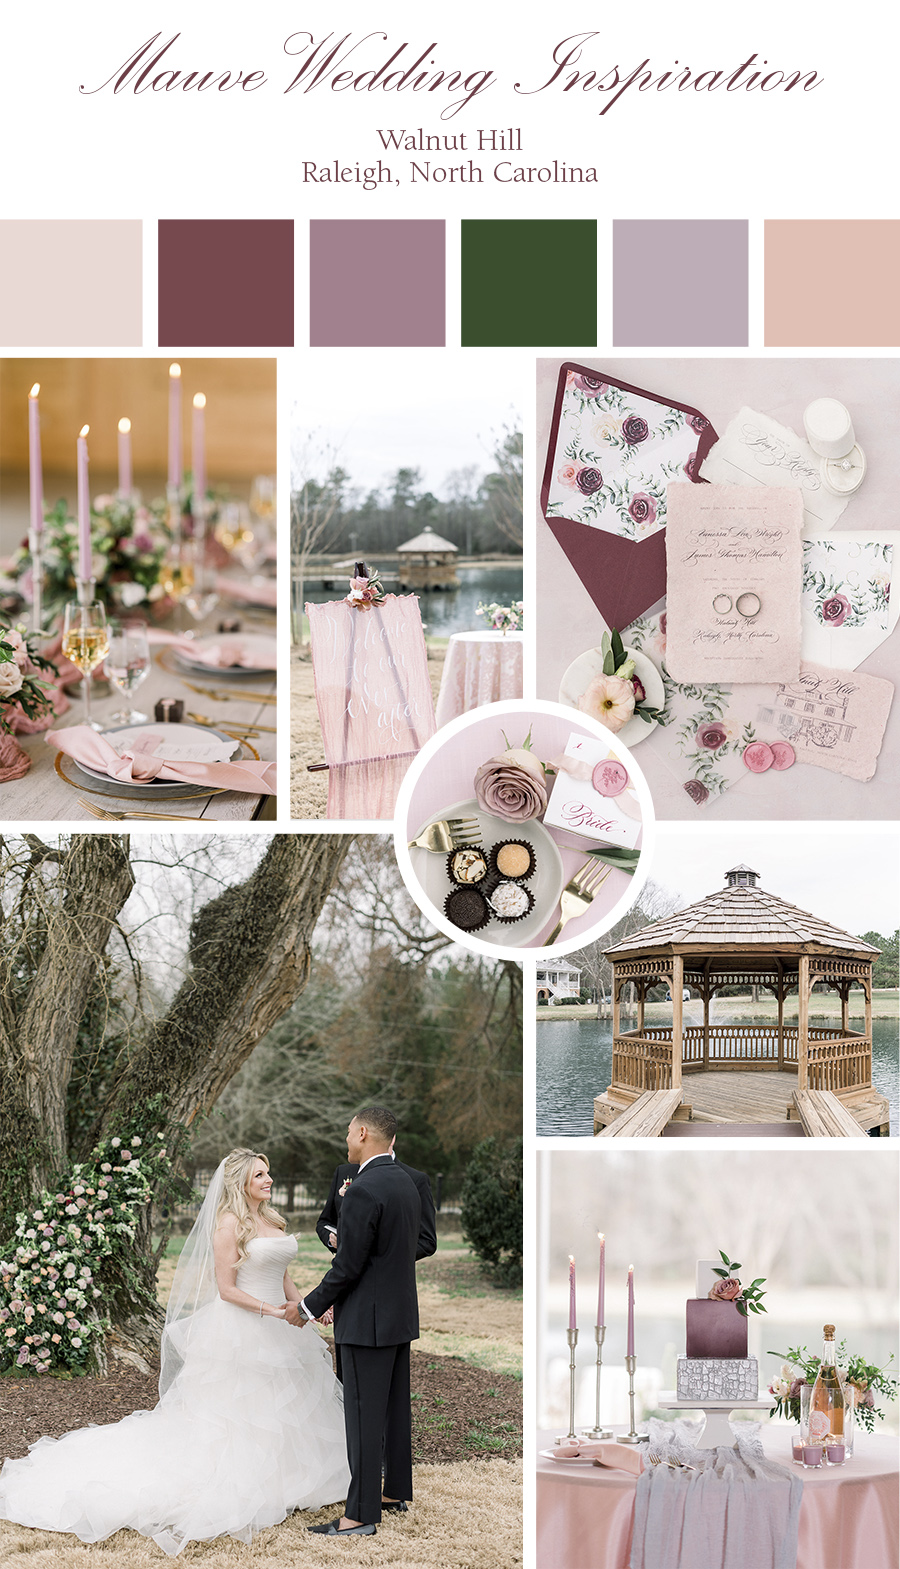 Modern elegant farm wedding inspiration with mauve and pinks